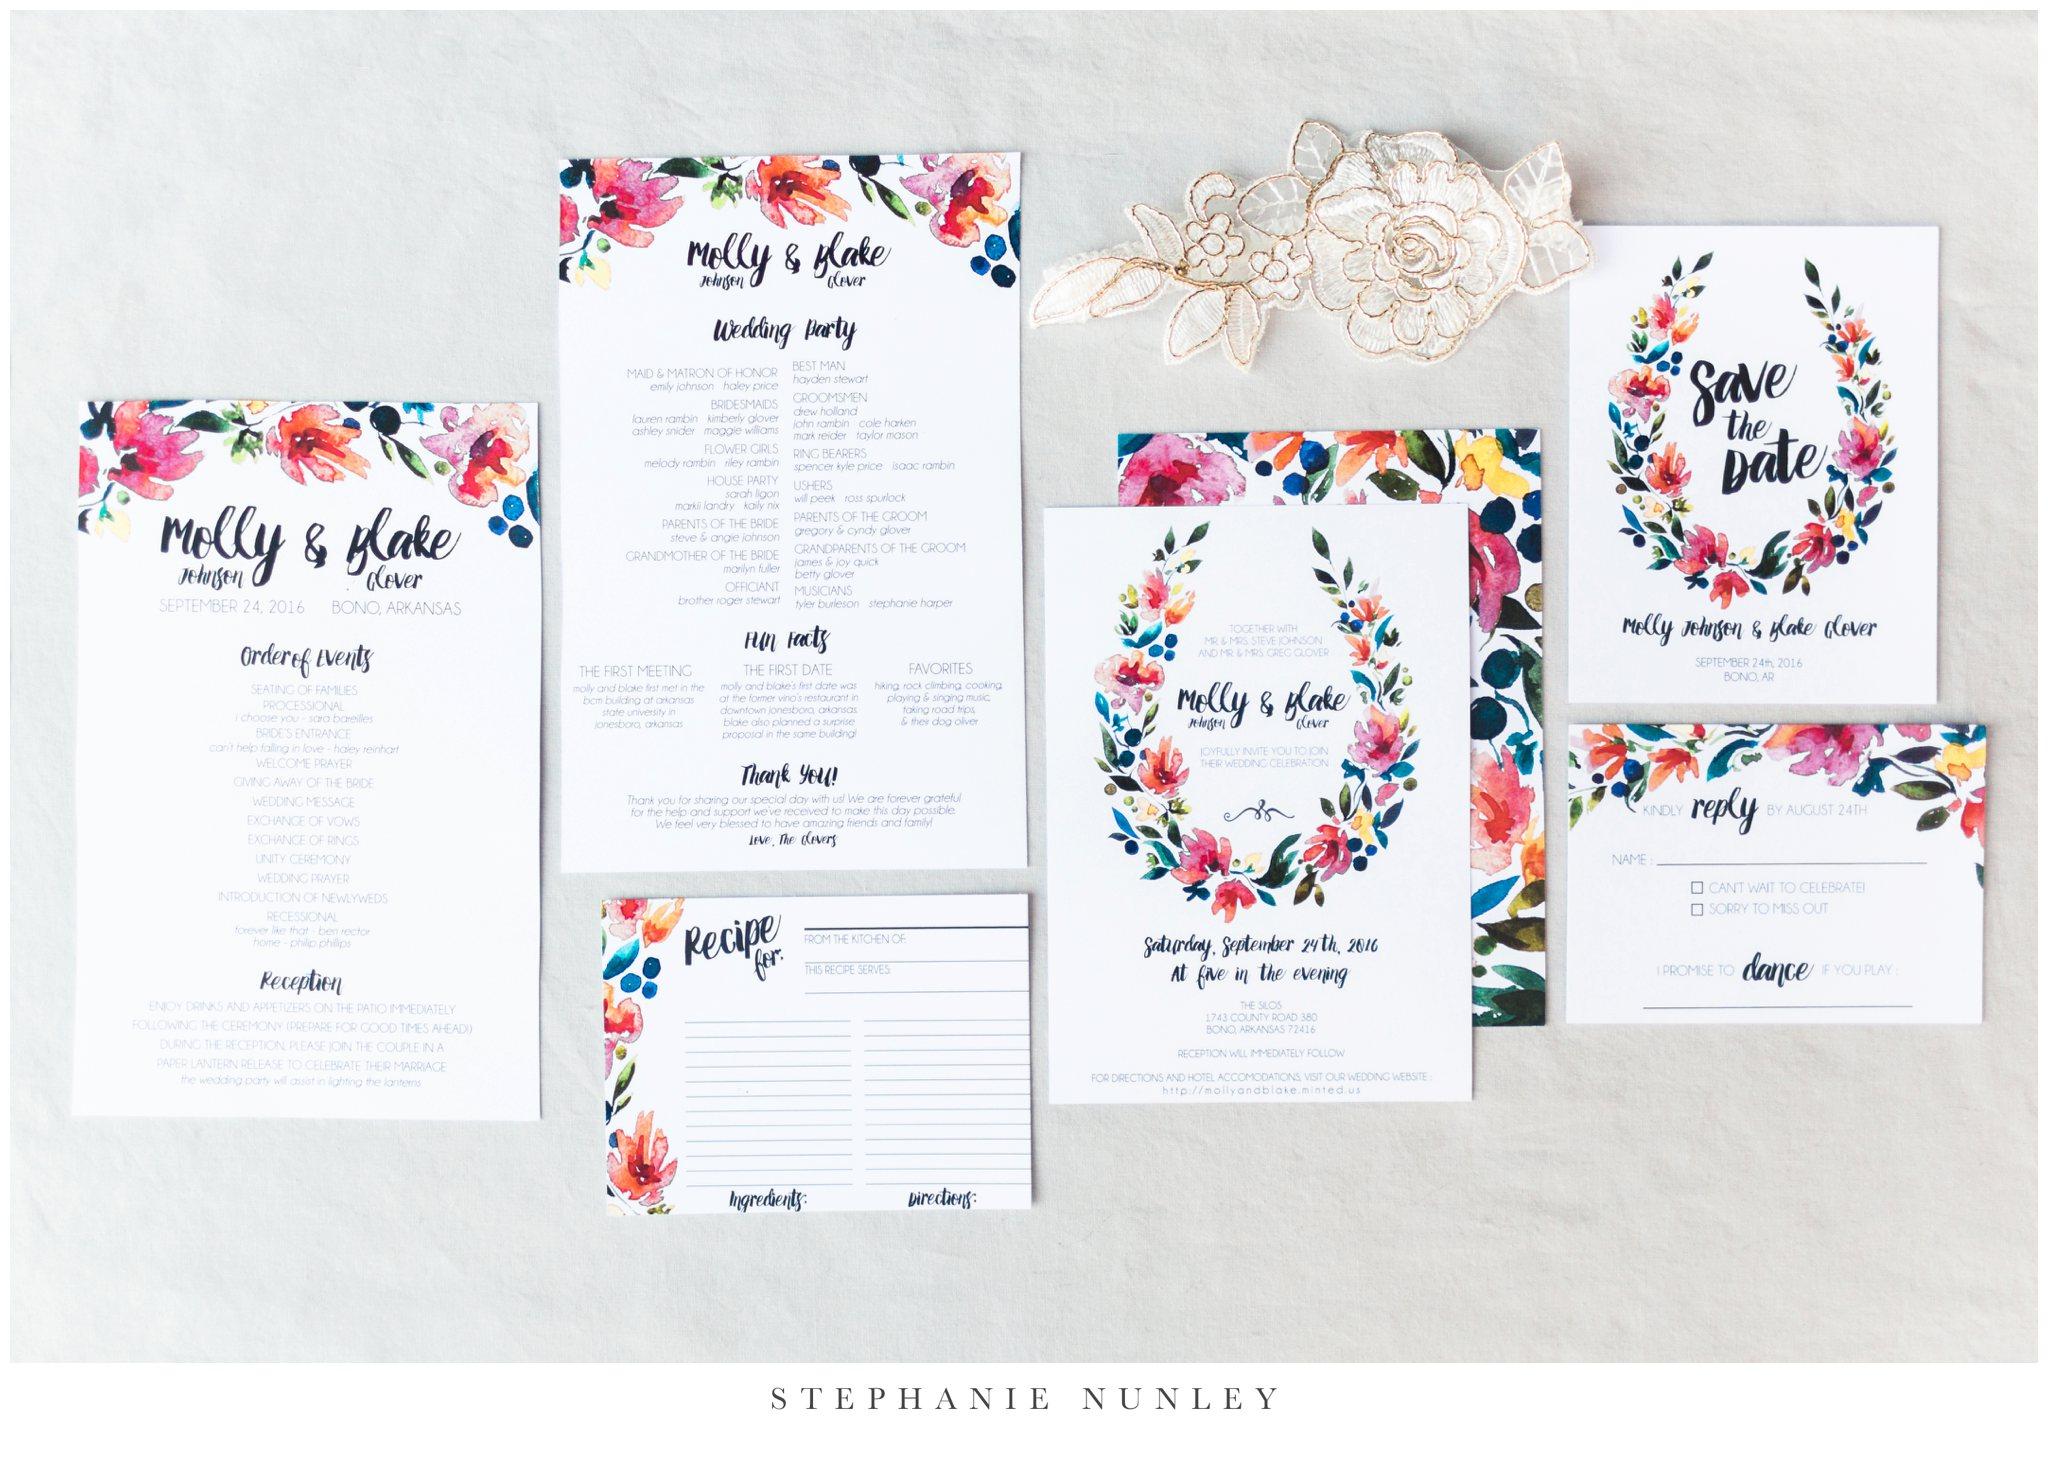 arkansas-wedding-with-lush-wildflower-bouquet-0002.jpg